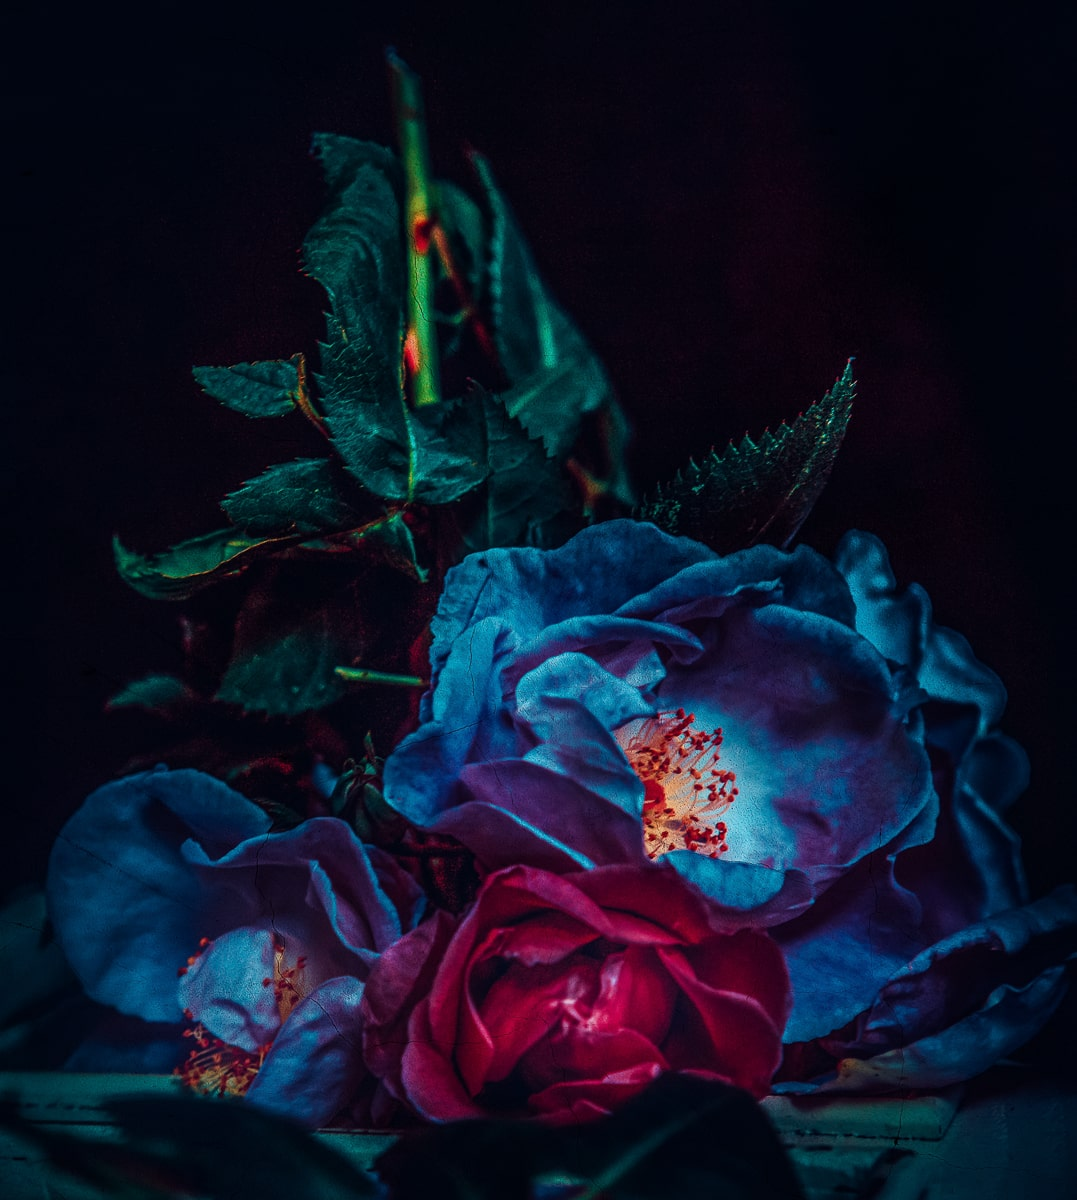 Blue Rose I @ Twin Peaks Studios